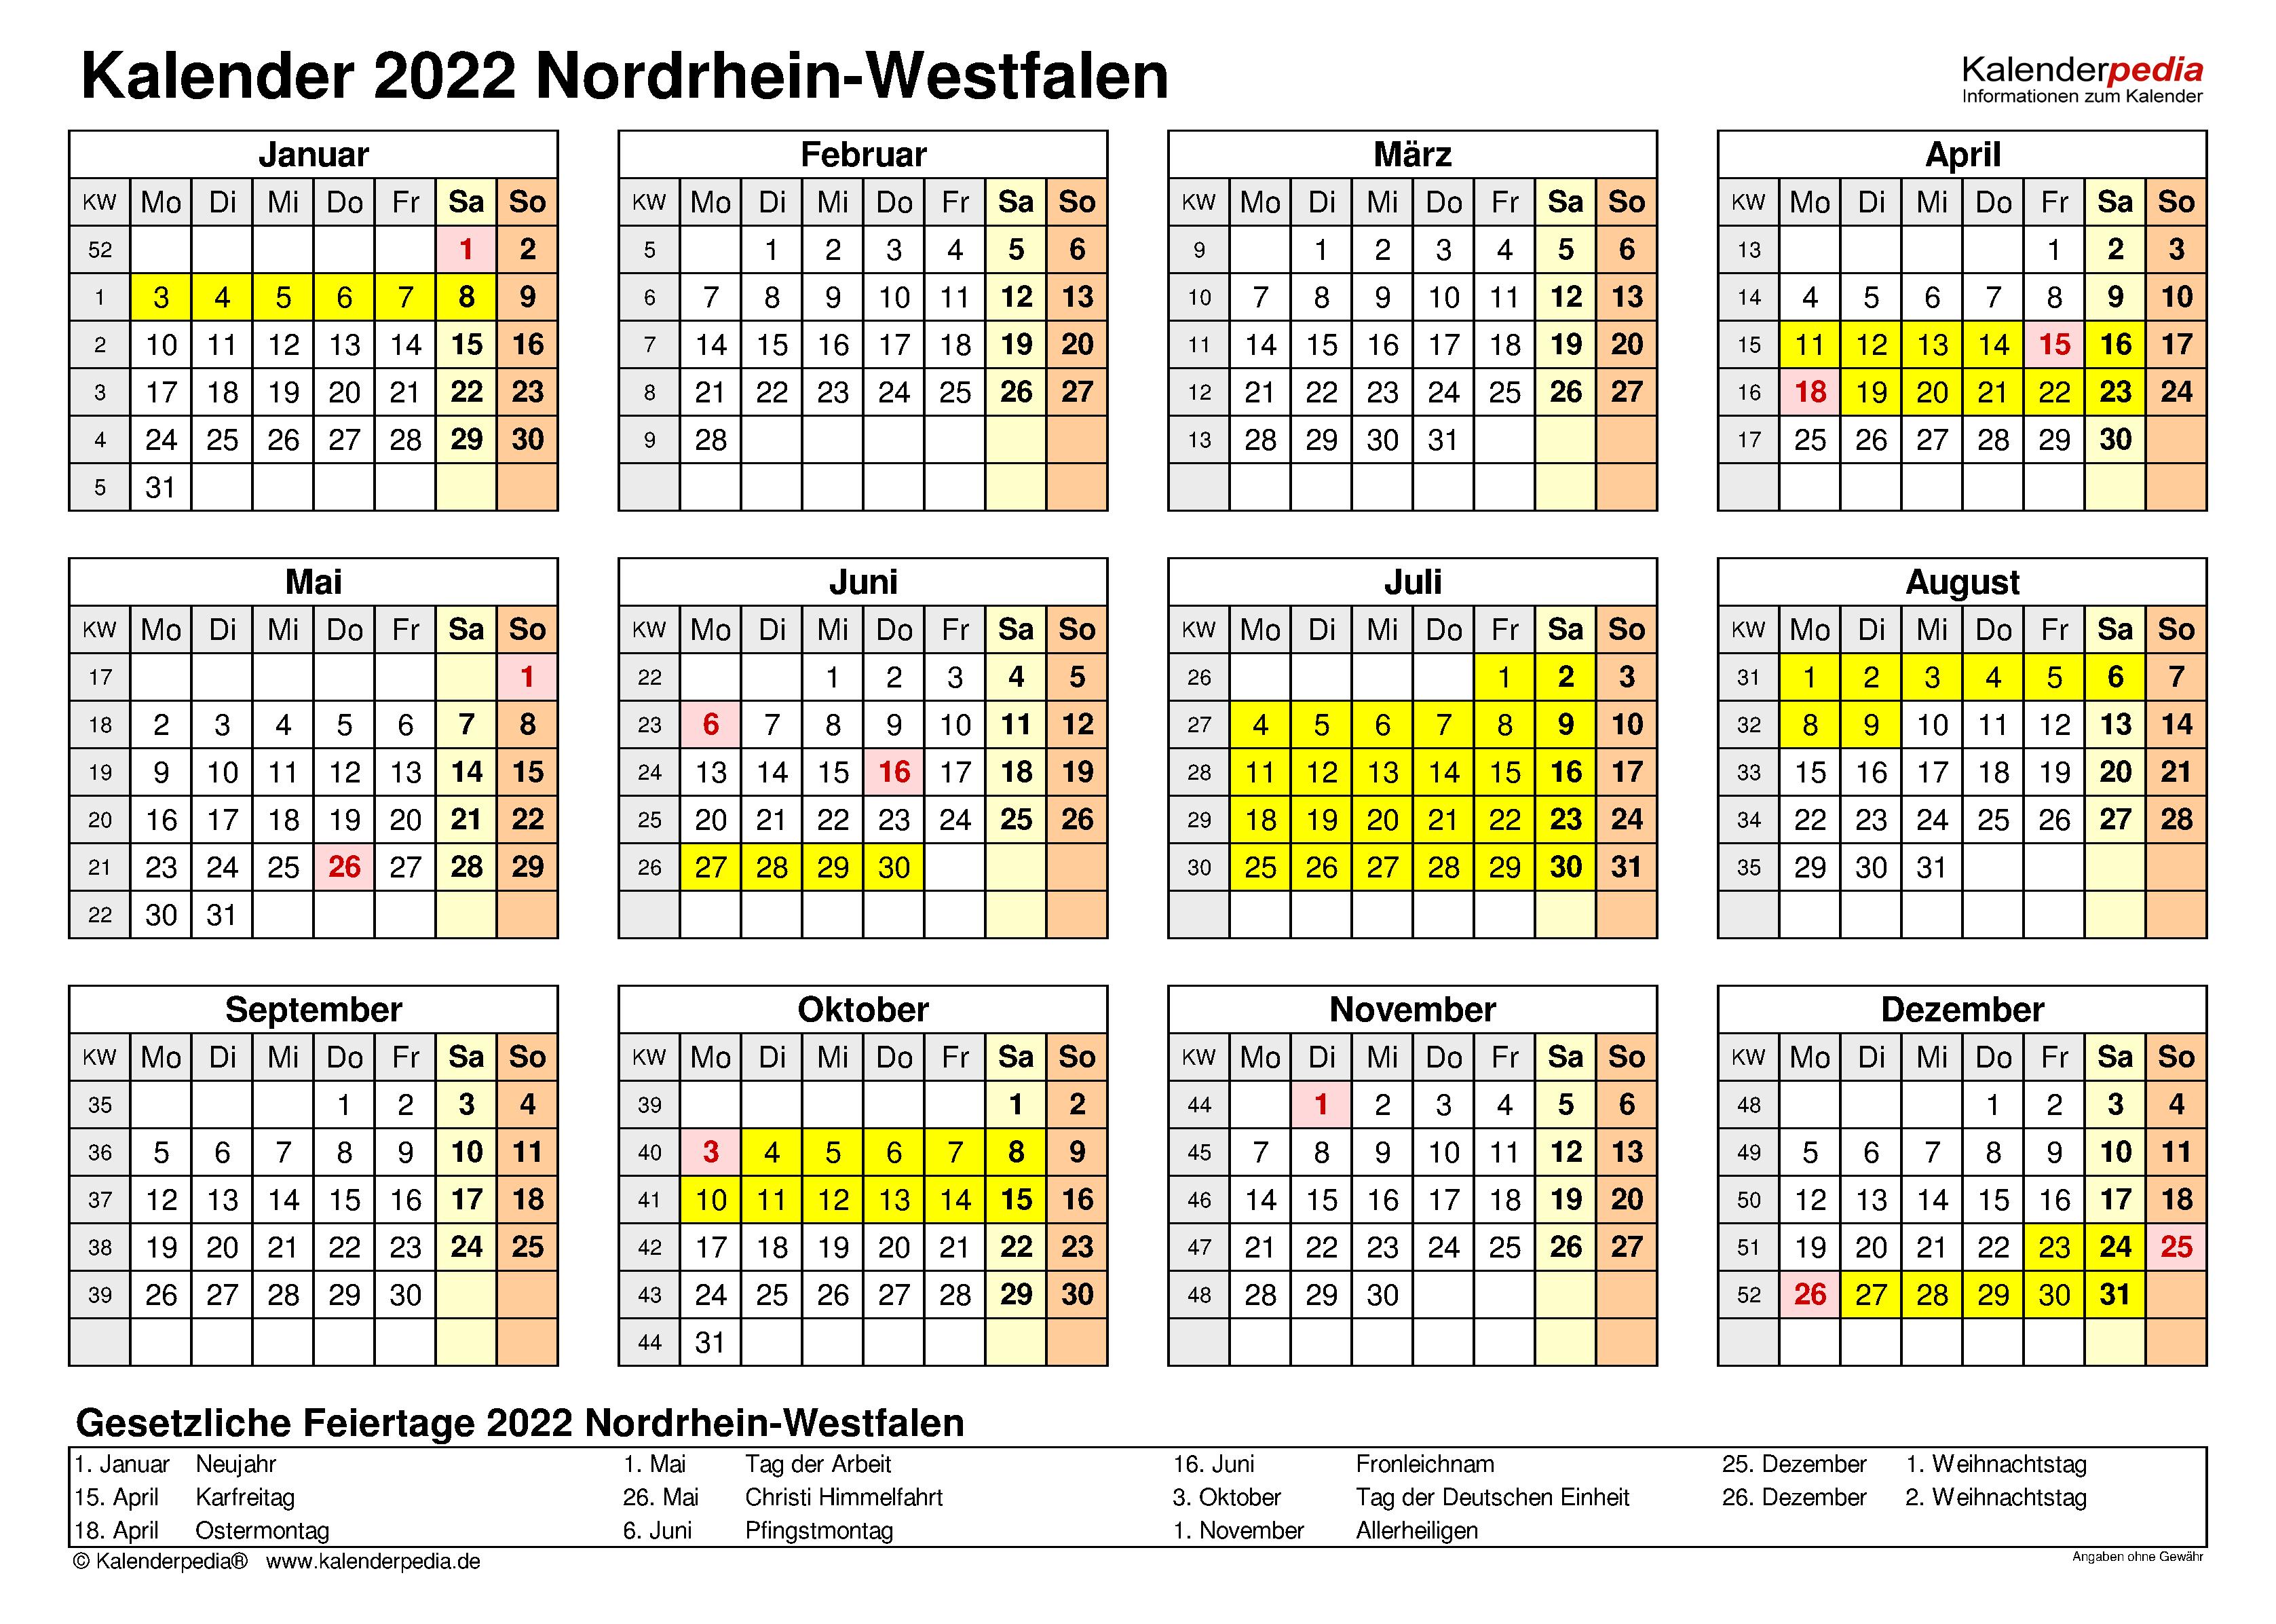 ostern 2022 nrw